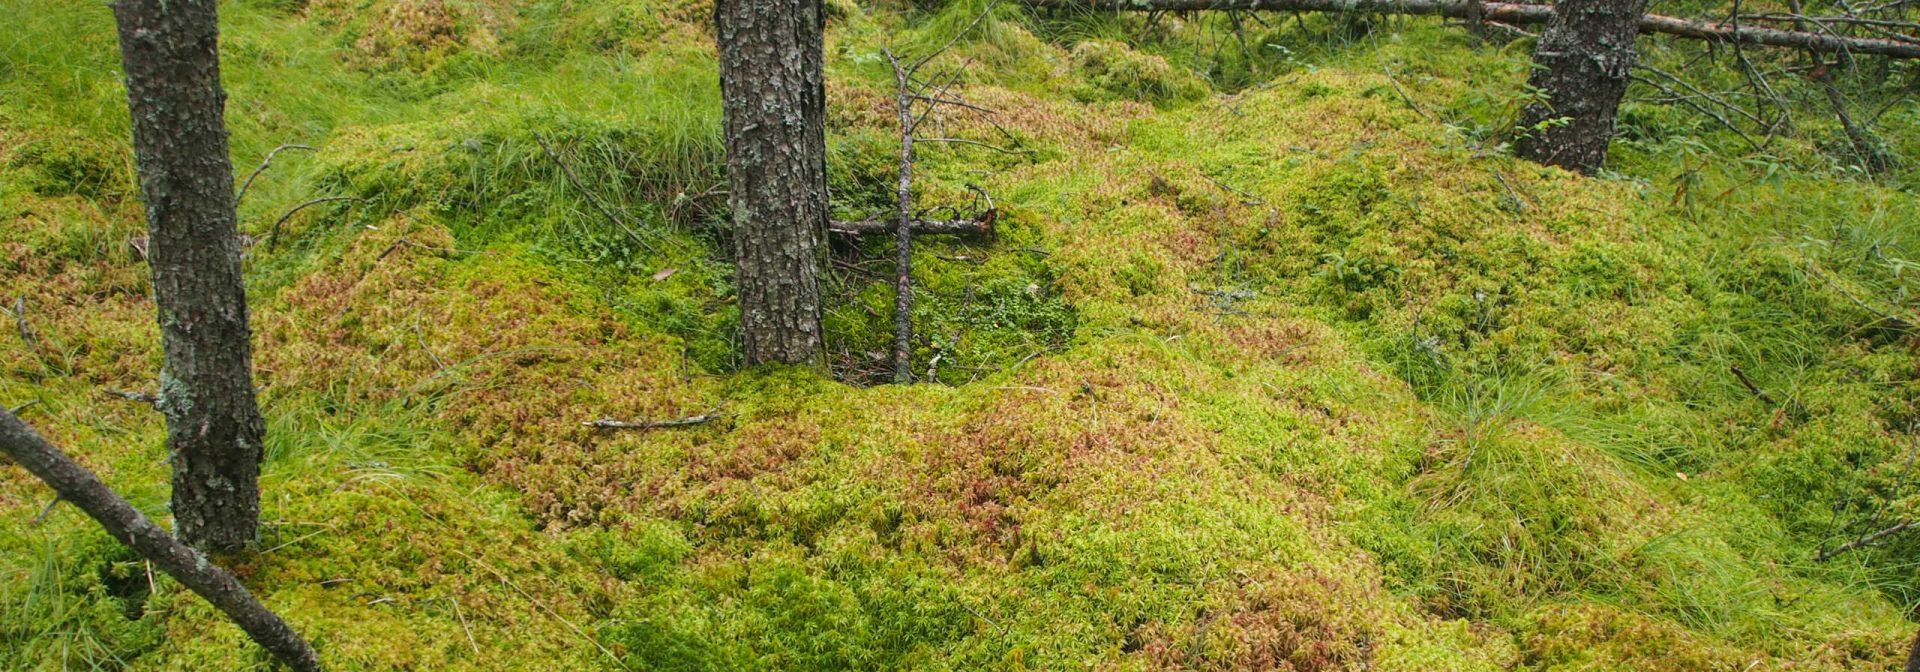 Bog with Sphagnum moss